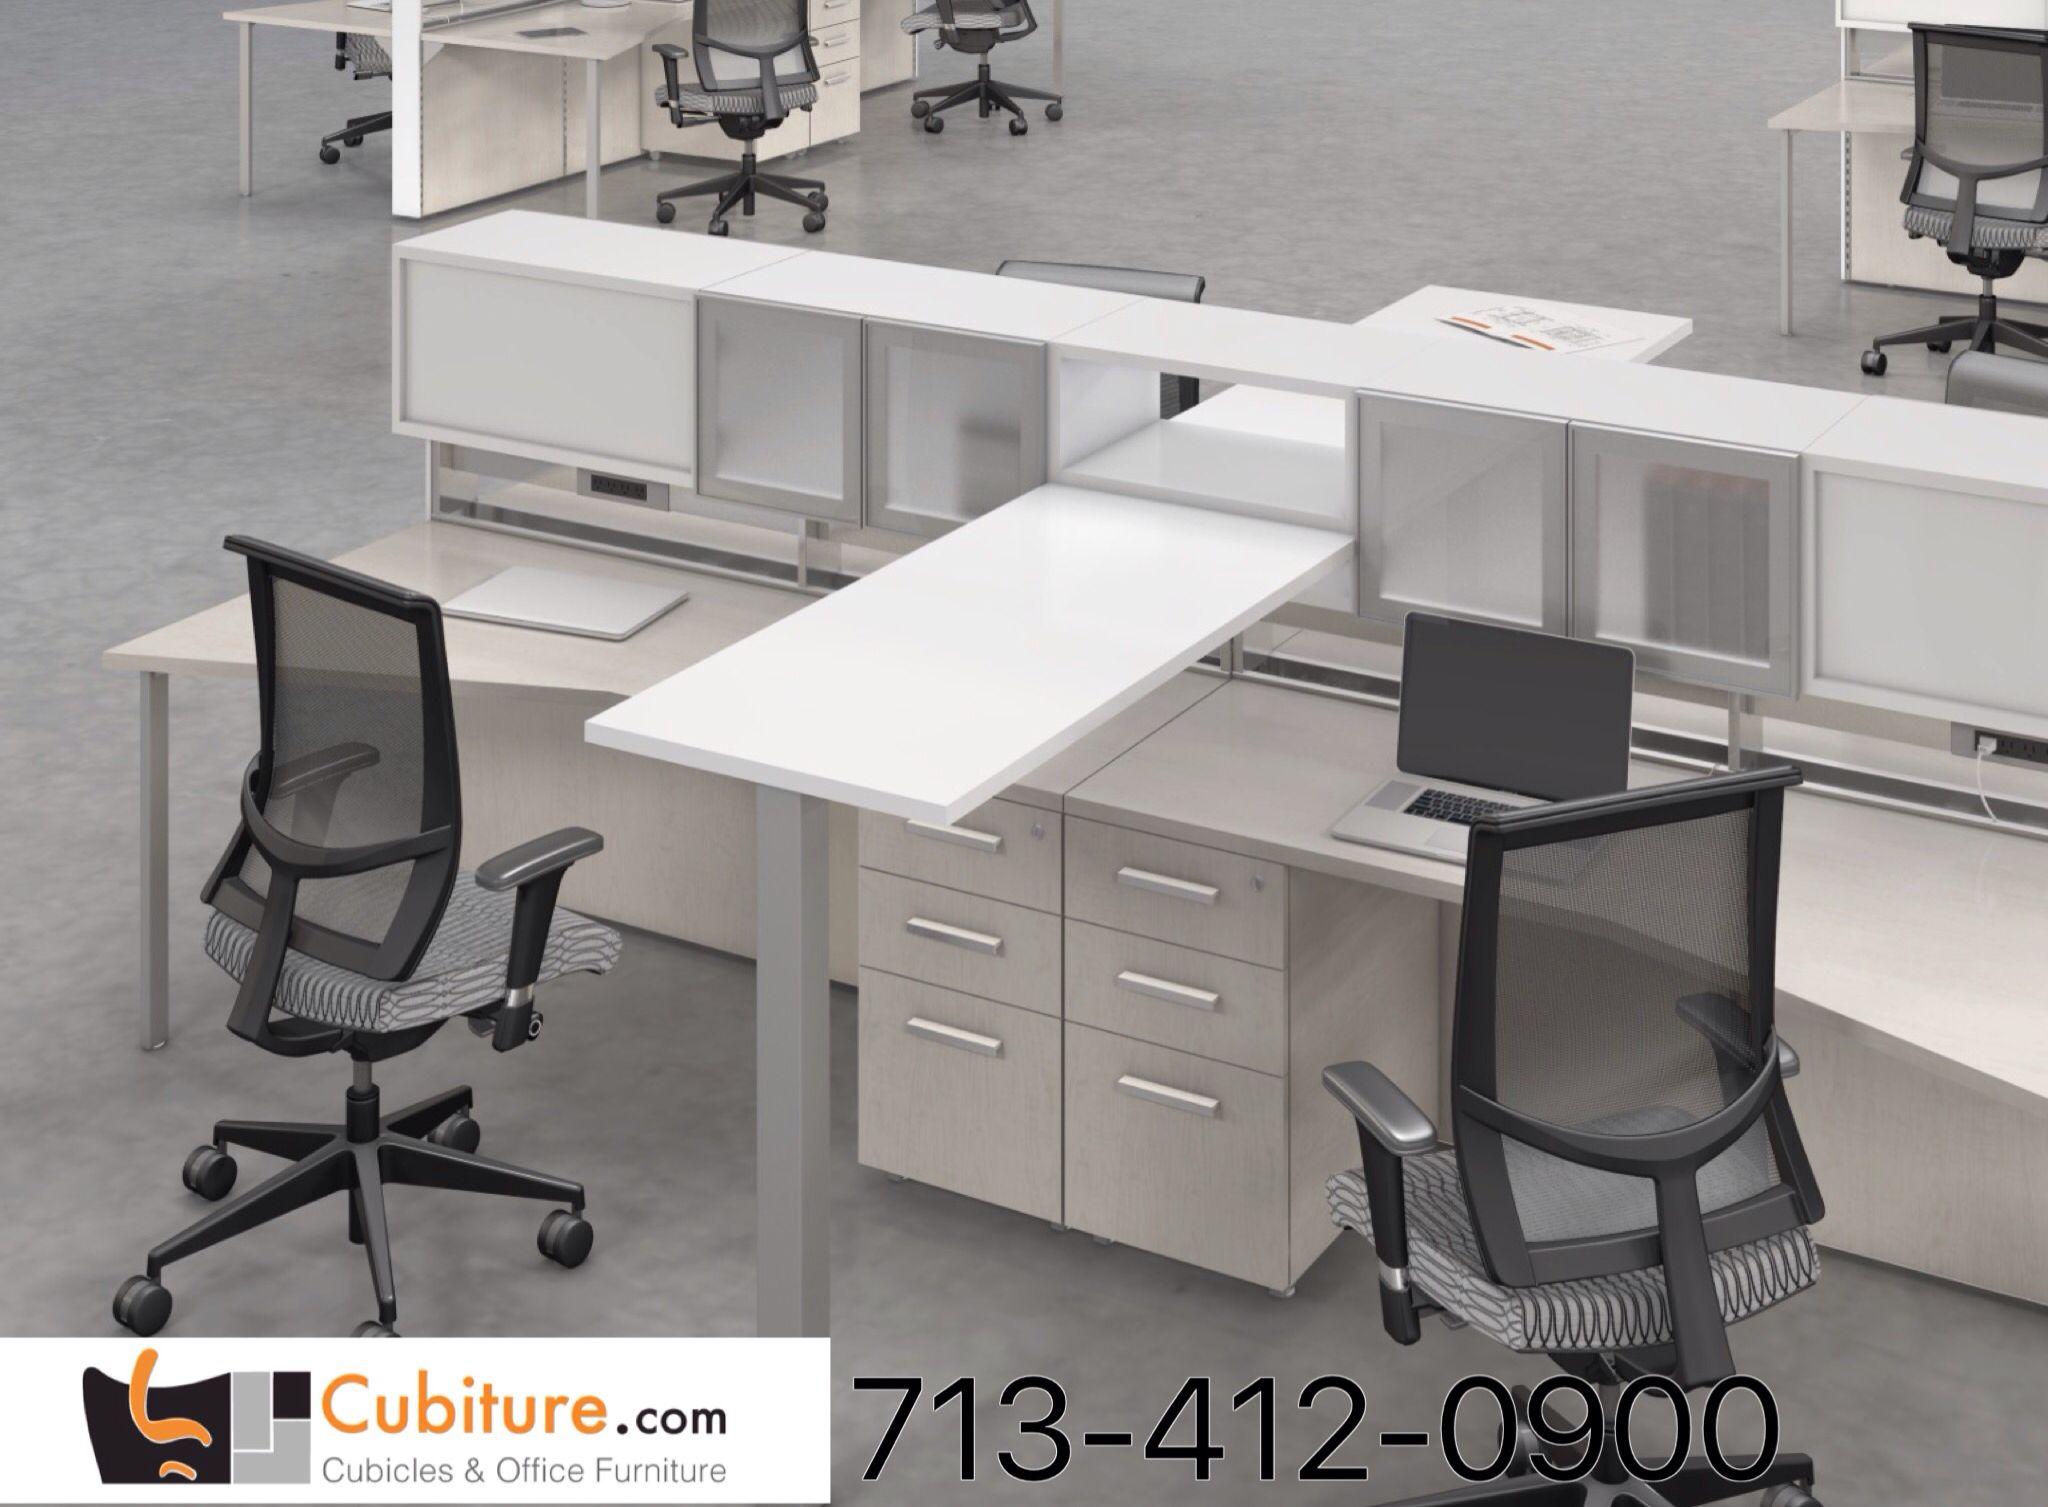 Www Cubiture Com Work Station Commercial Office